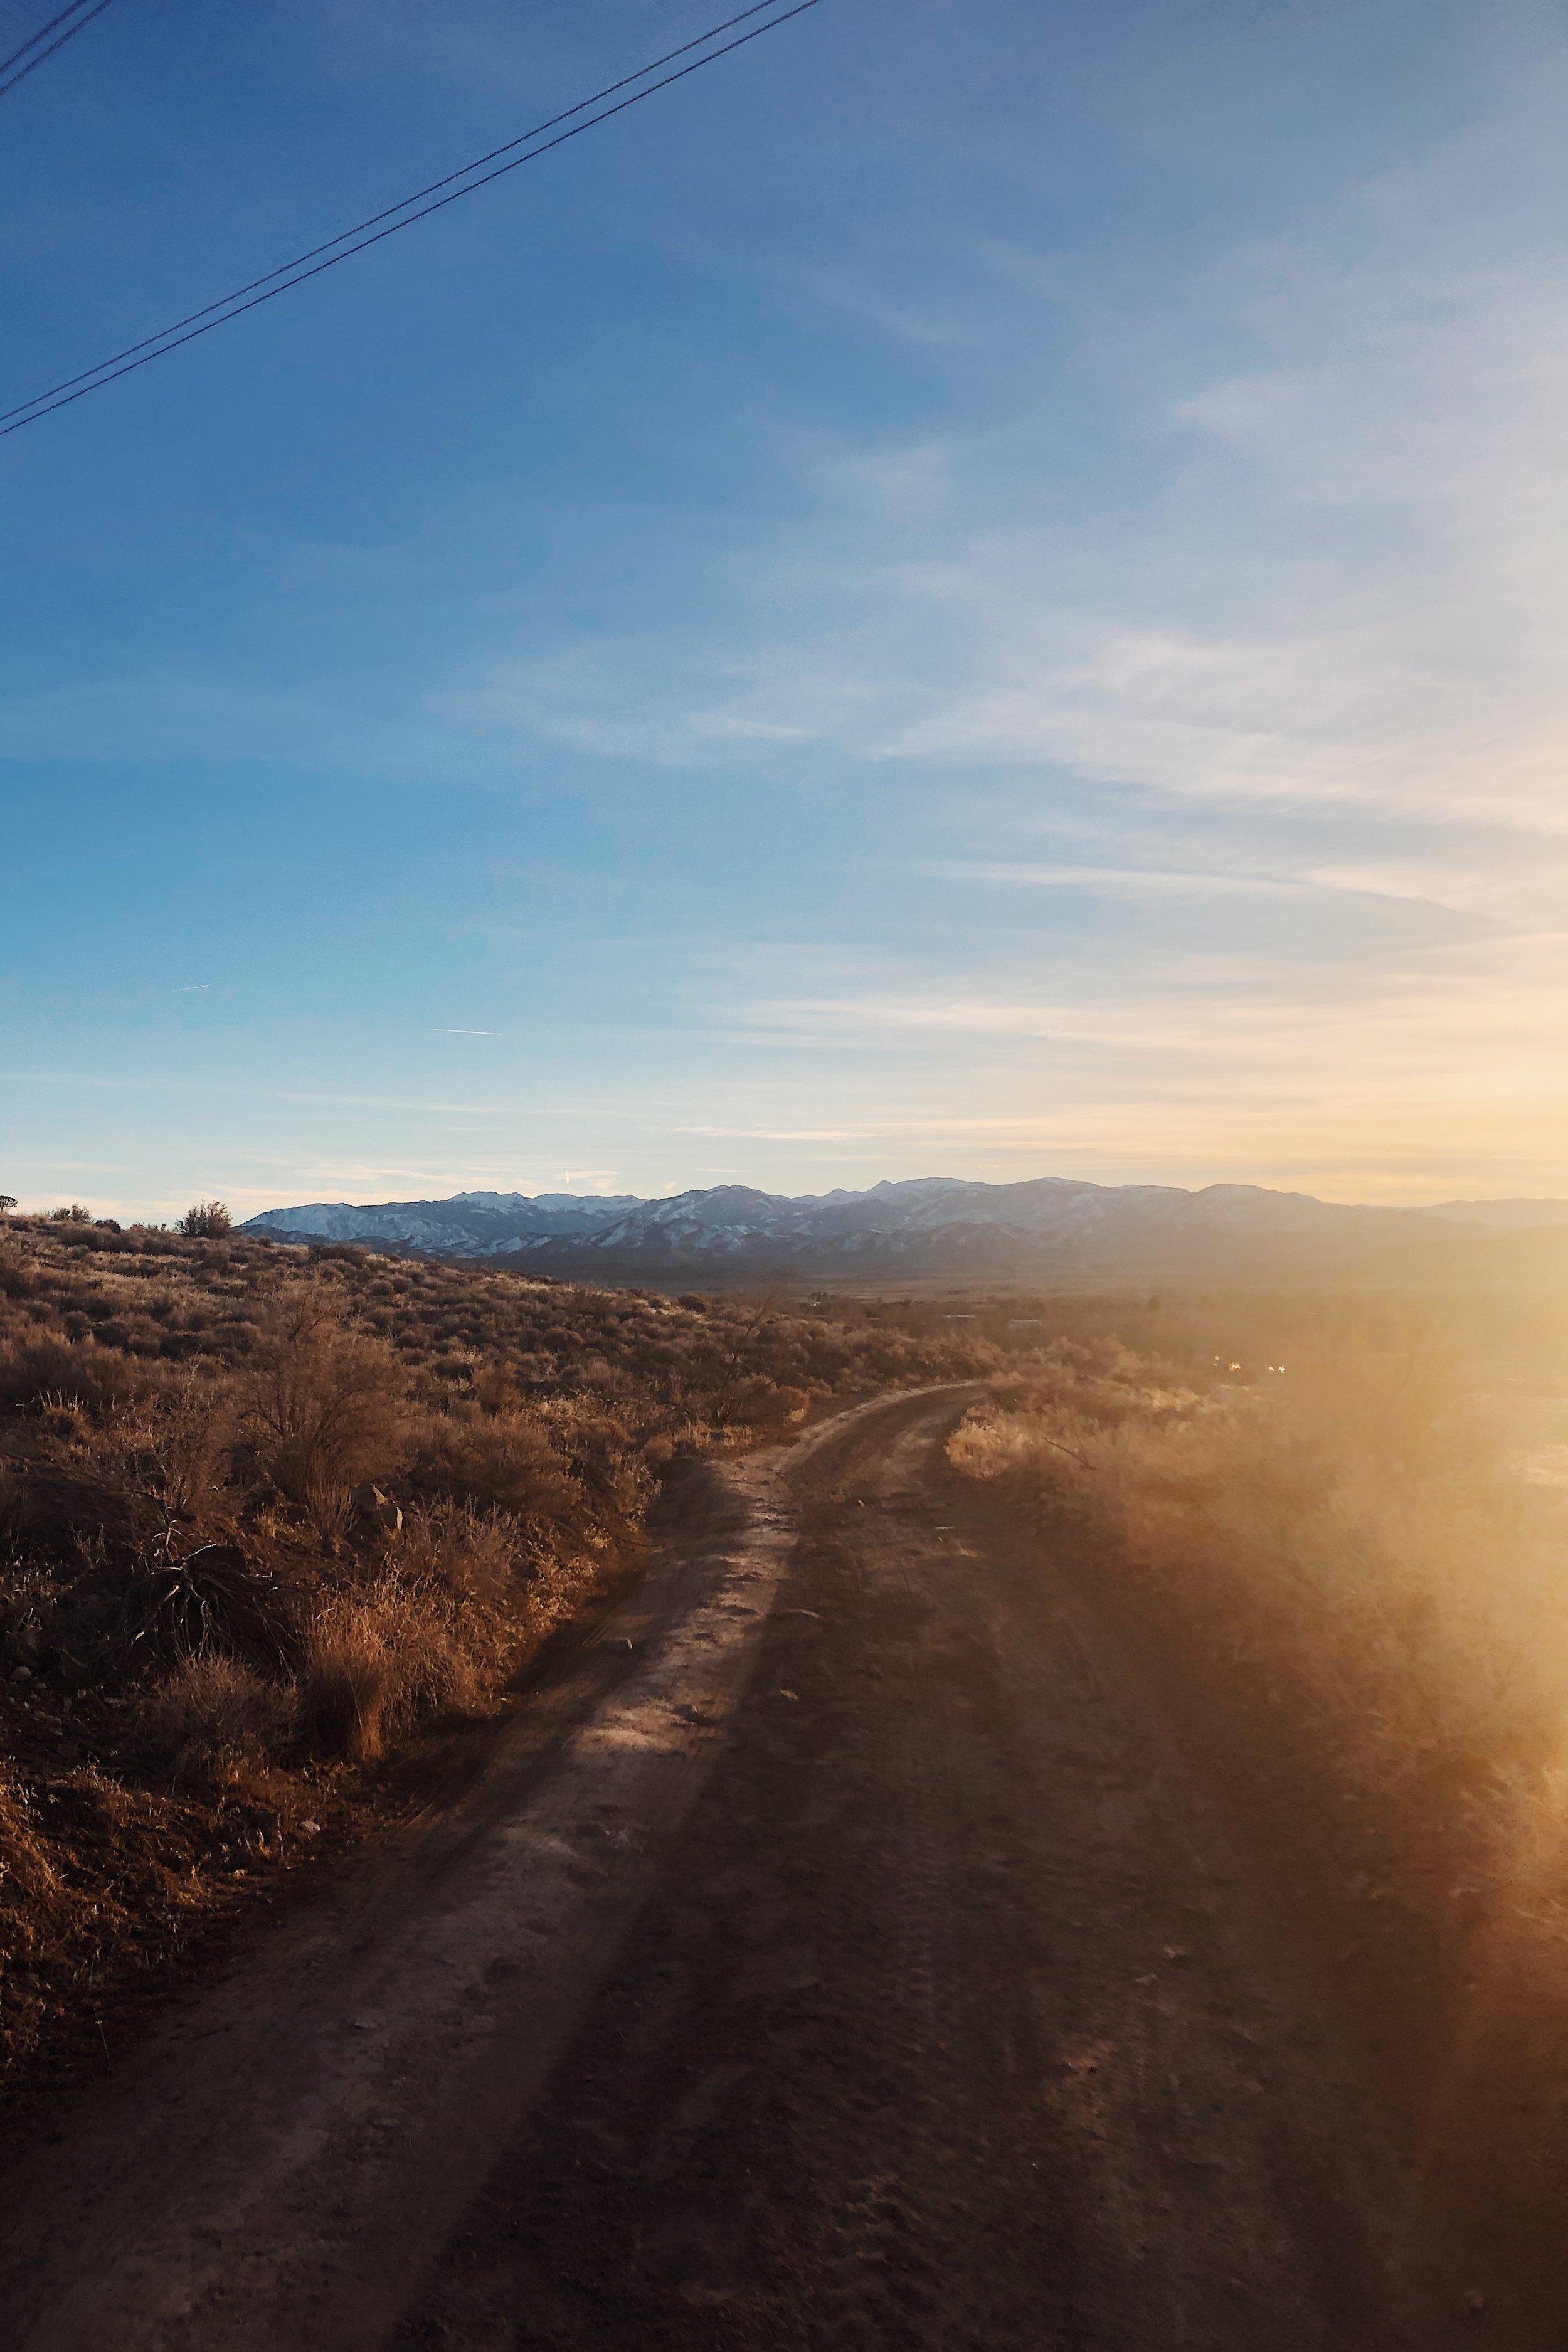 6. Utah Wilderness